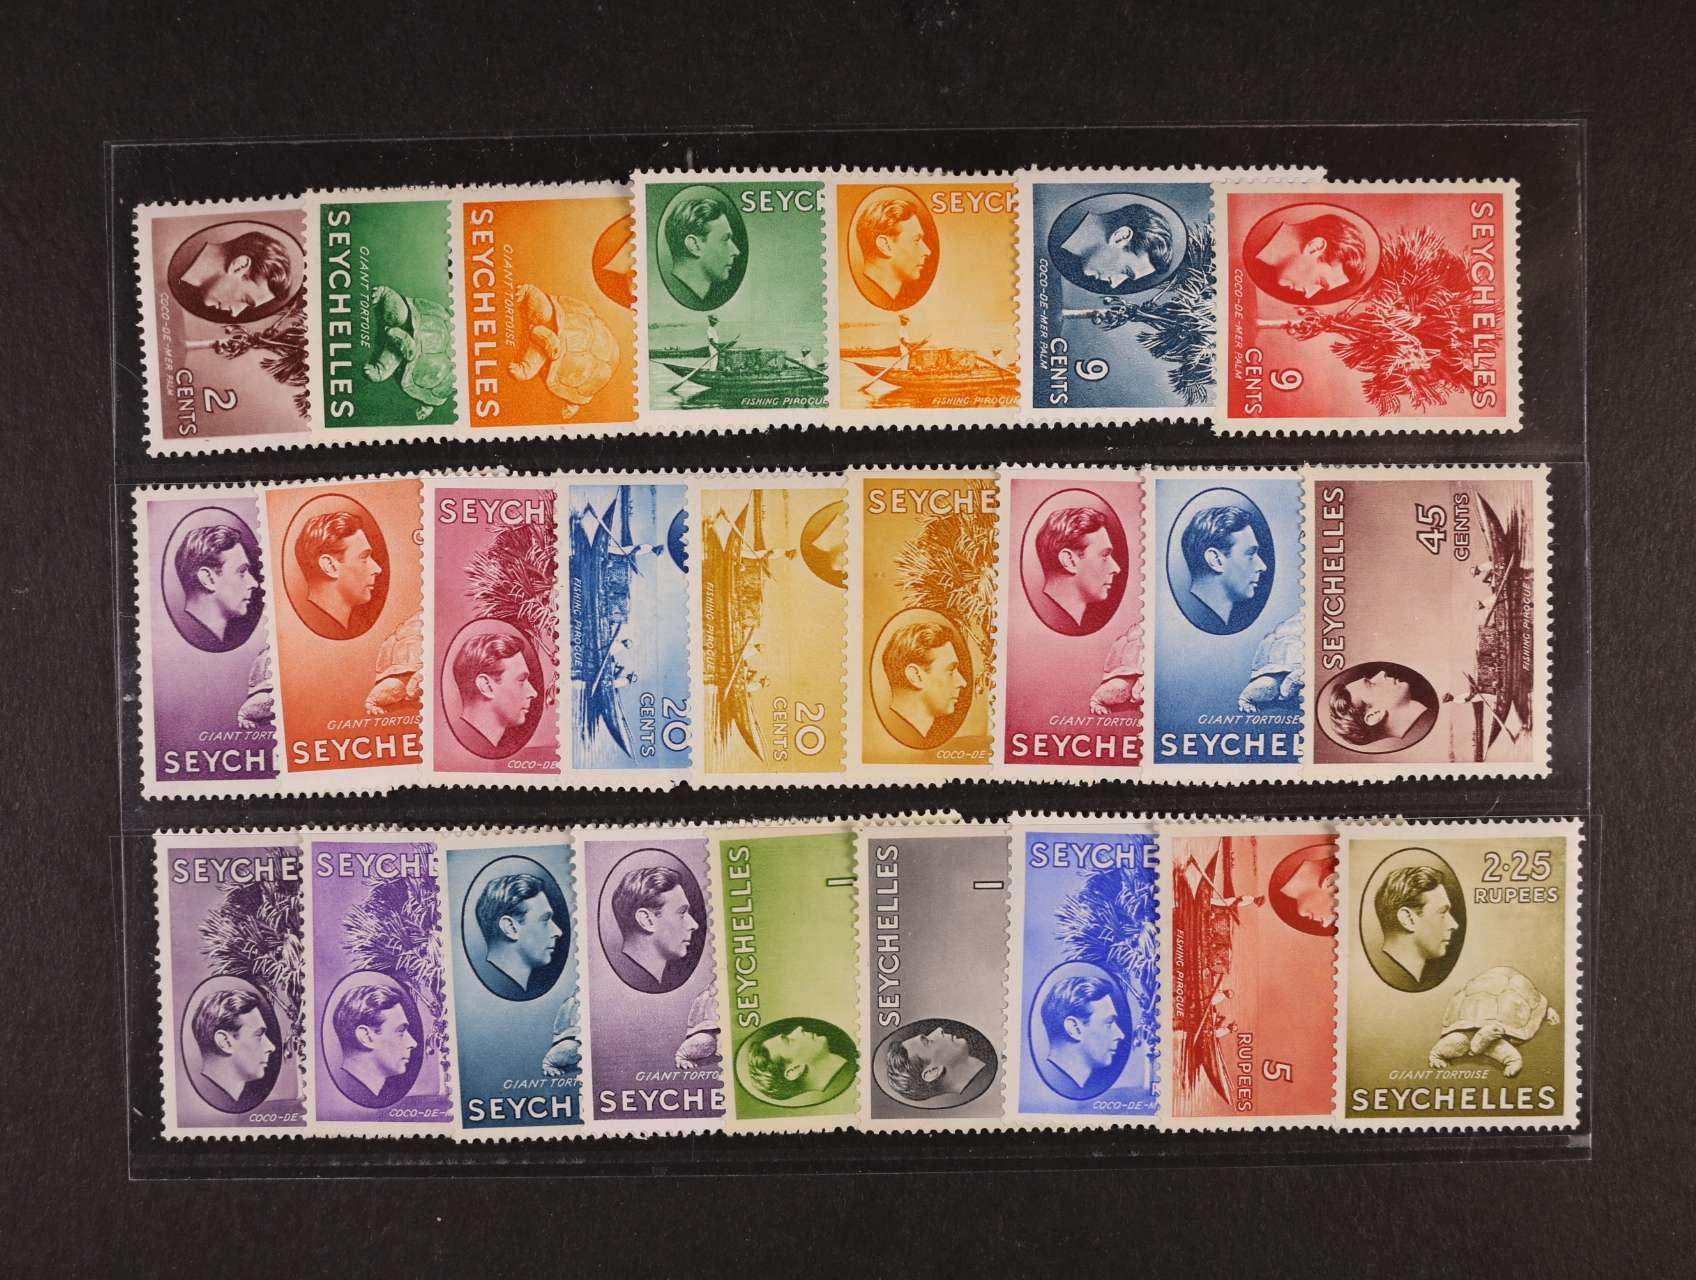 Seychelles - zn. SG č. 135 - 49, 550 Liber